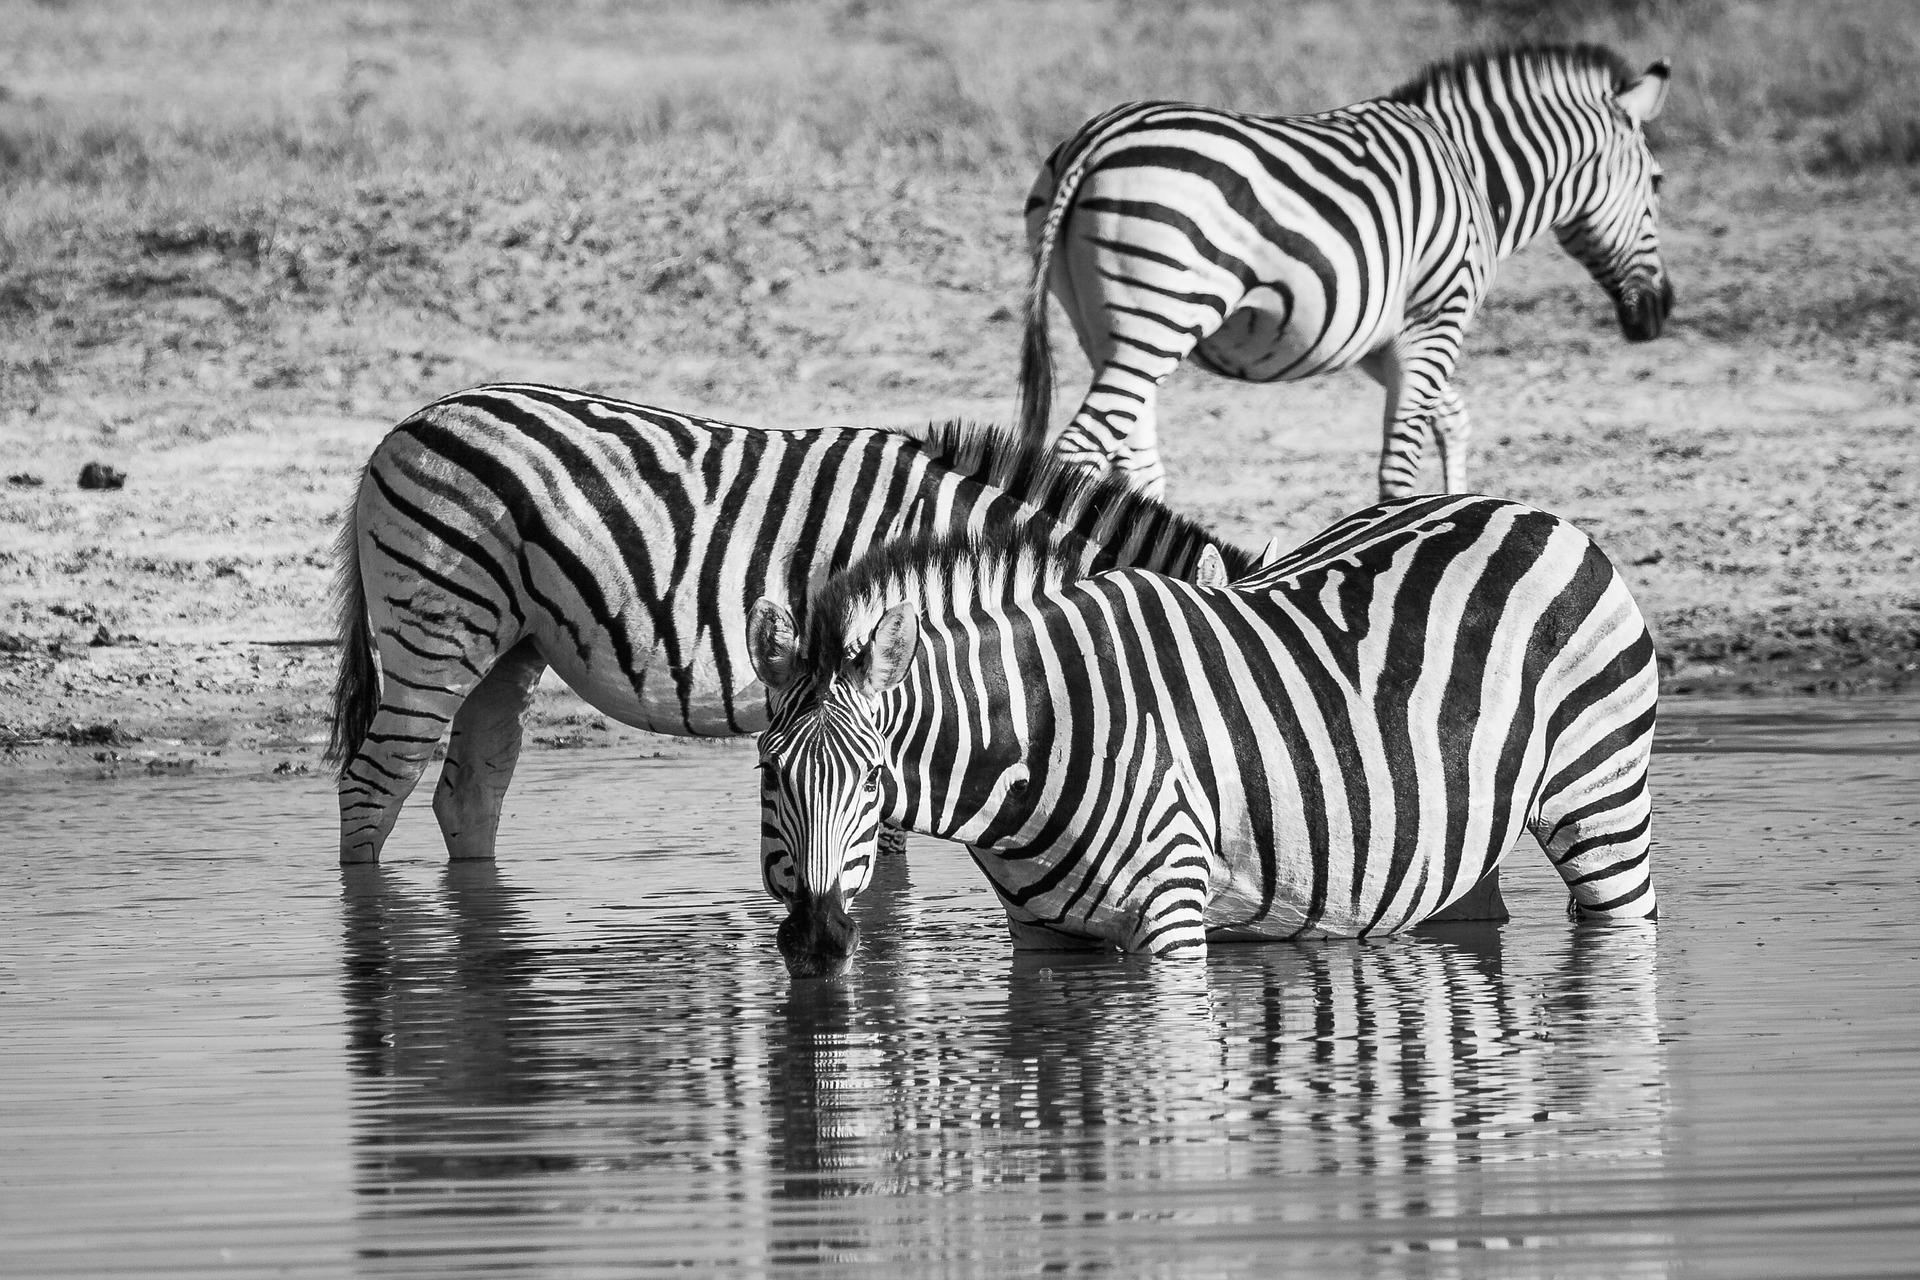 zebra-drinking-ea35b8092b_1920